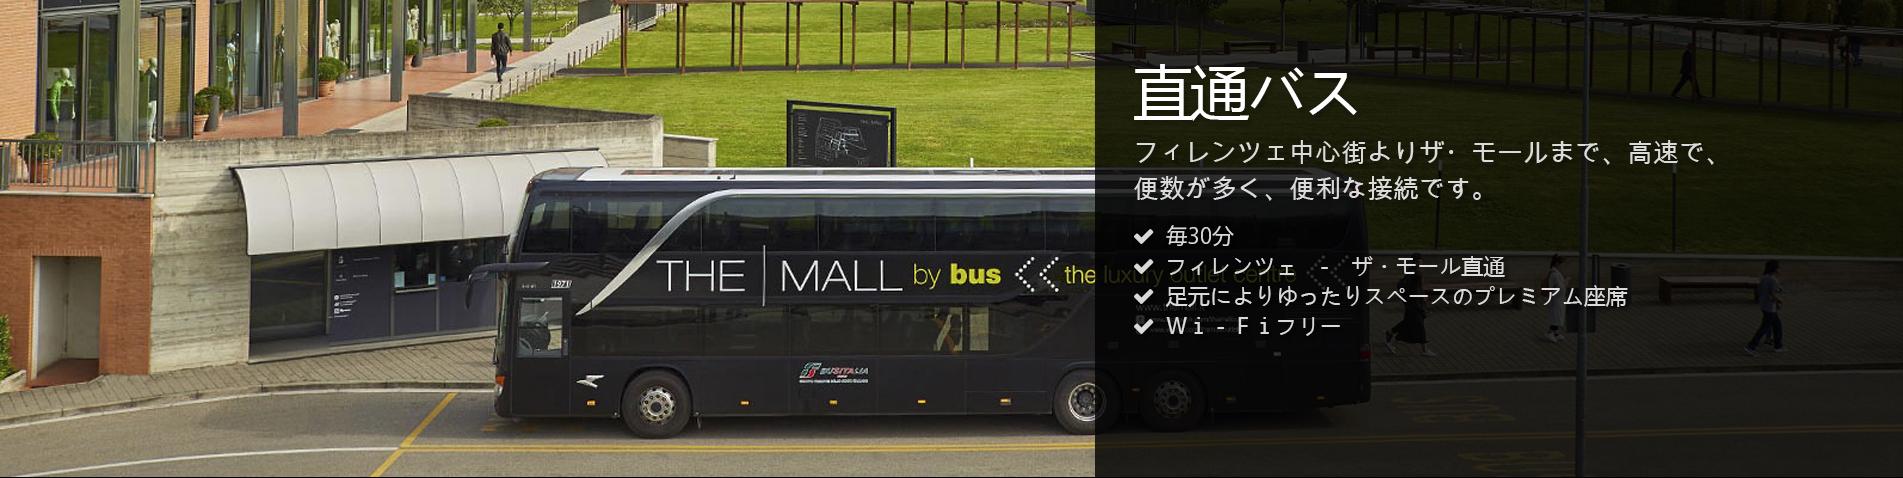 Home-Direct Bus testo Ja